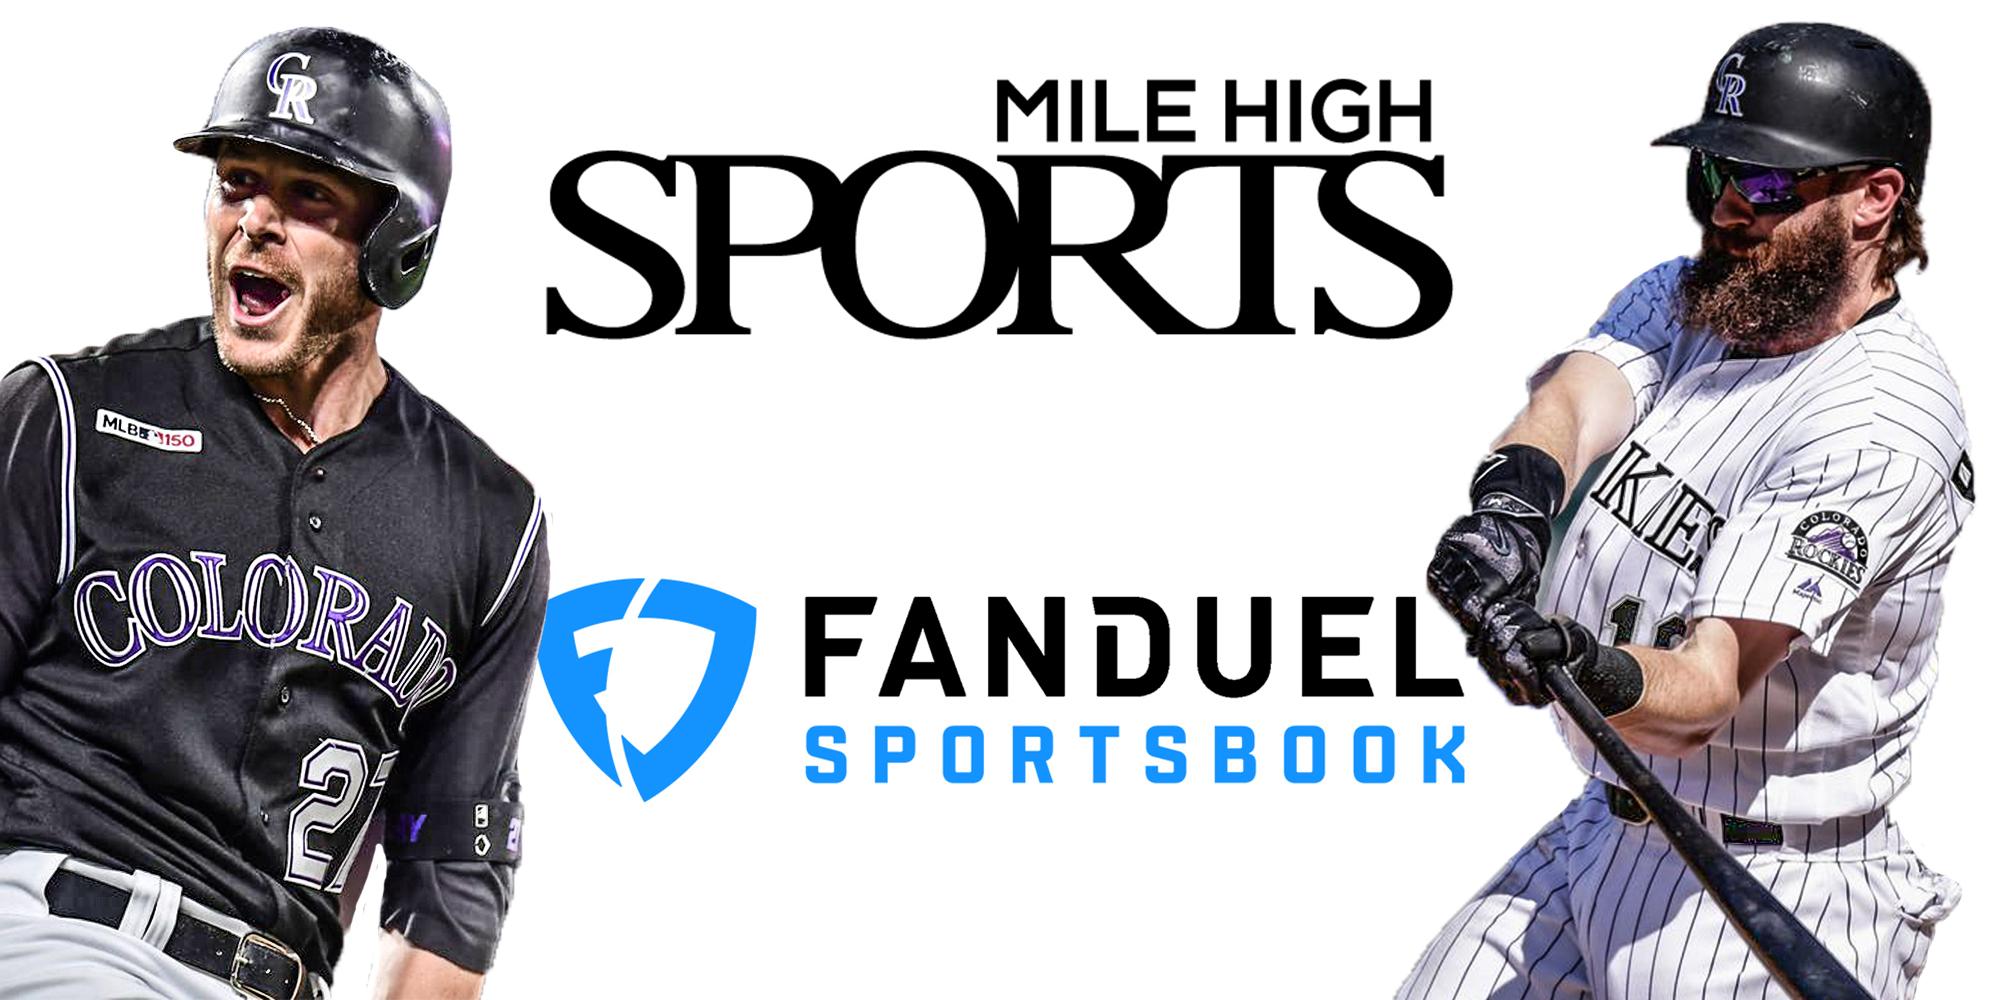 Mile High Sports, FanDuel Sportsbook MLB Futures, Trevor Story, Charlie Blackmon